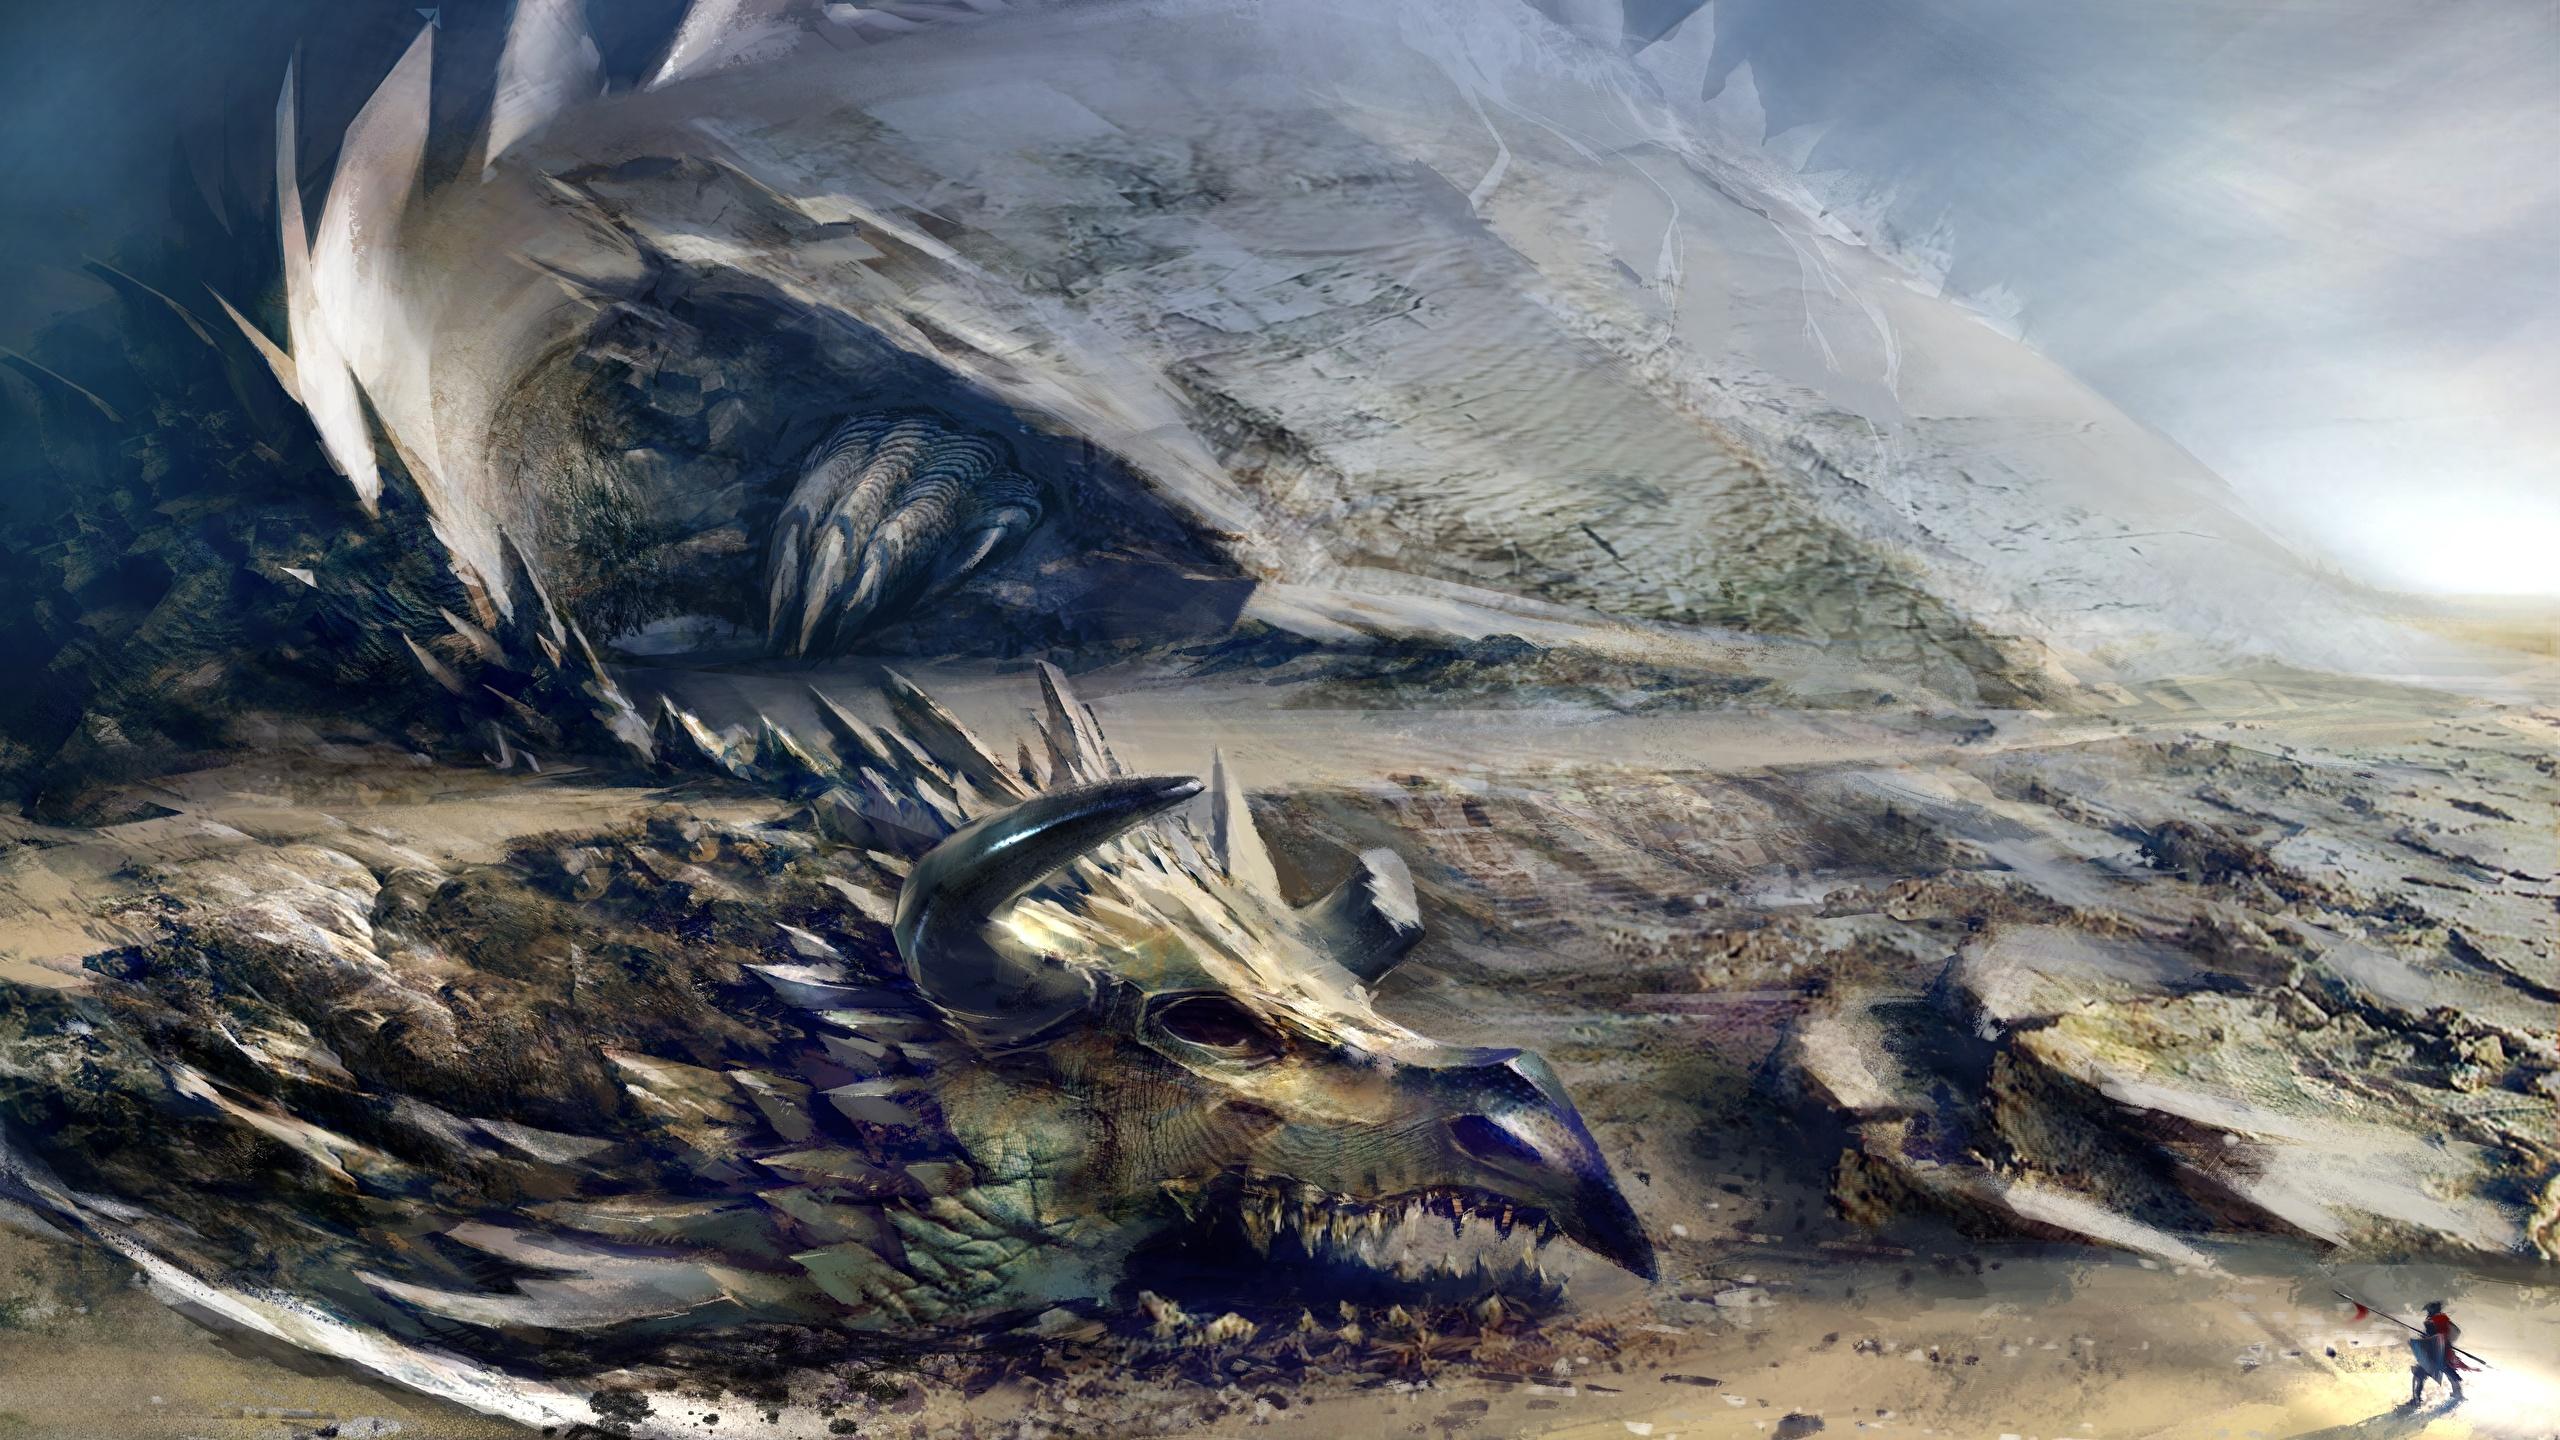 Photo Guild Wars Guild Wars 2 Dragons Fantasy Vdeo Game 2560x1440